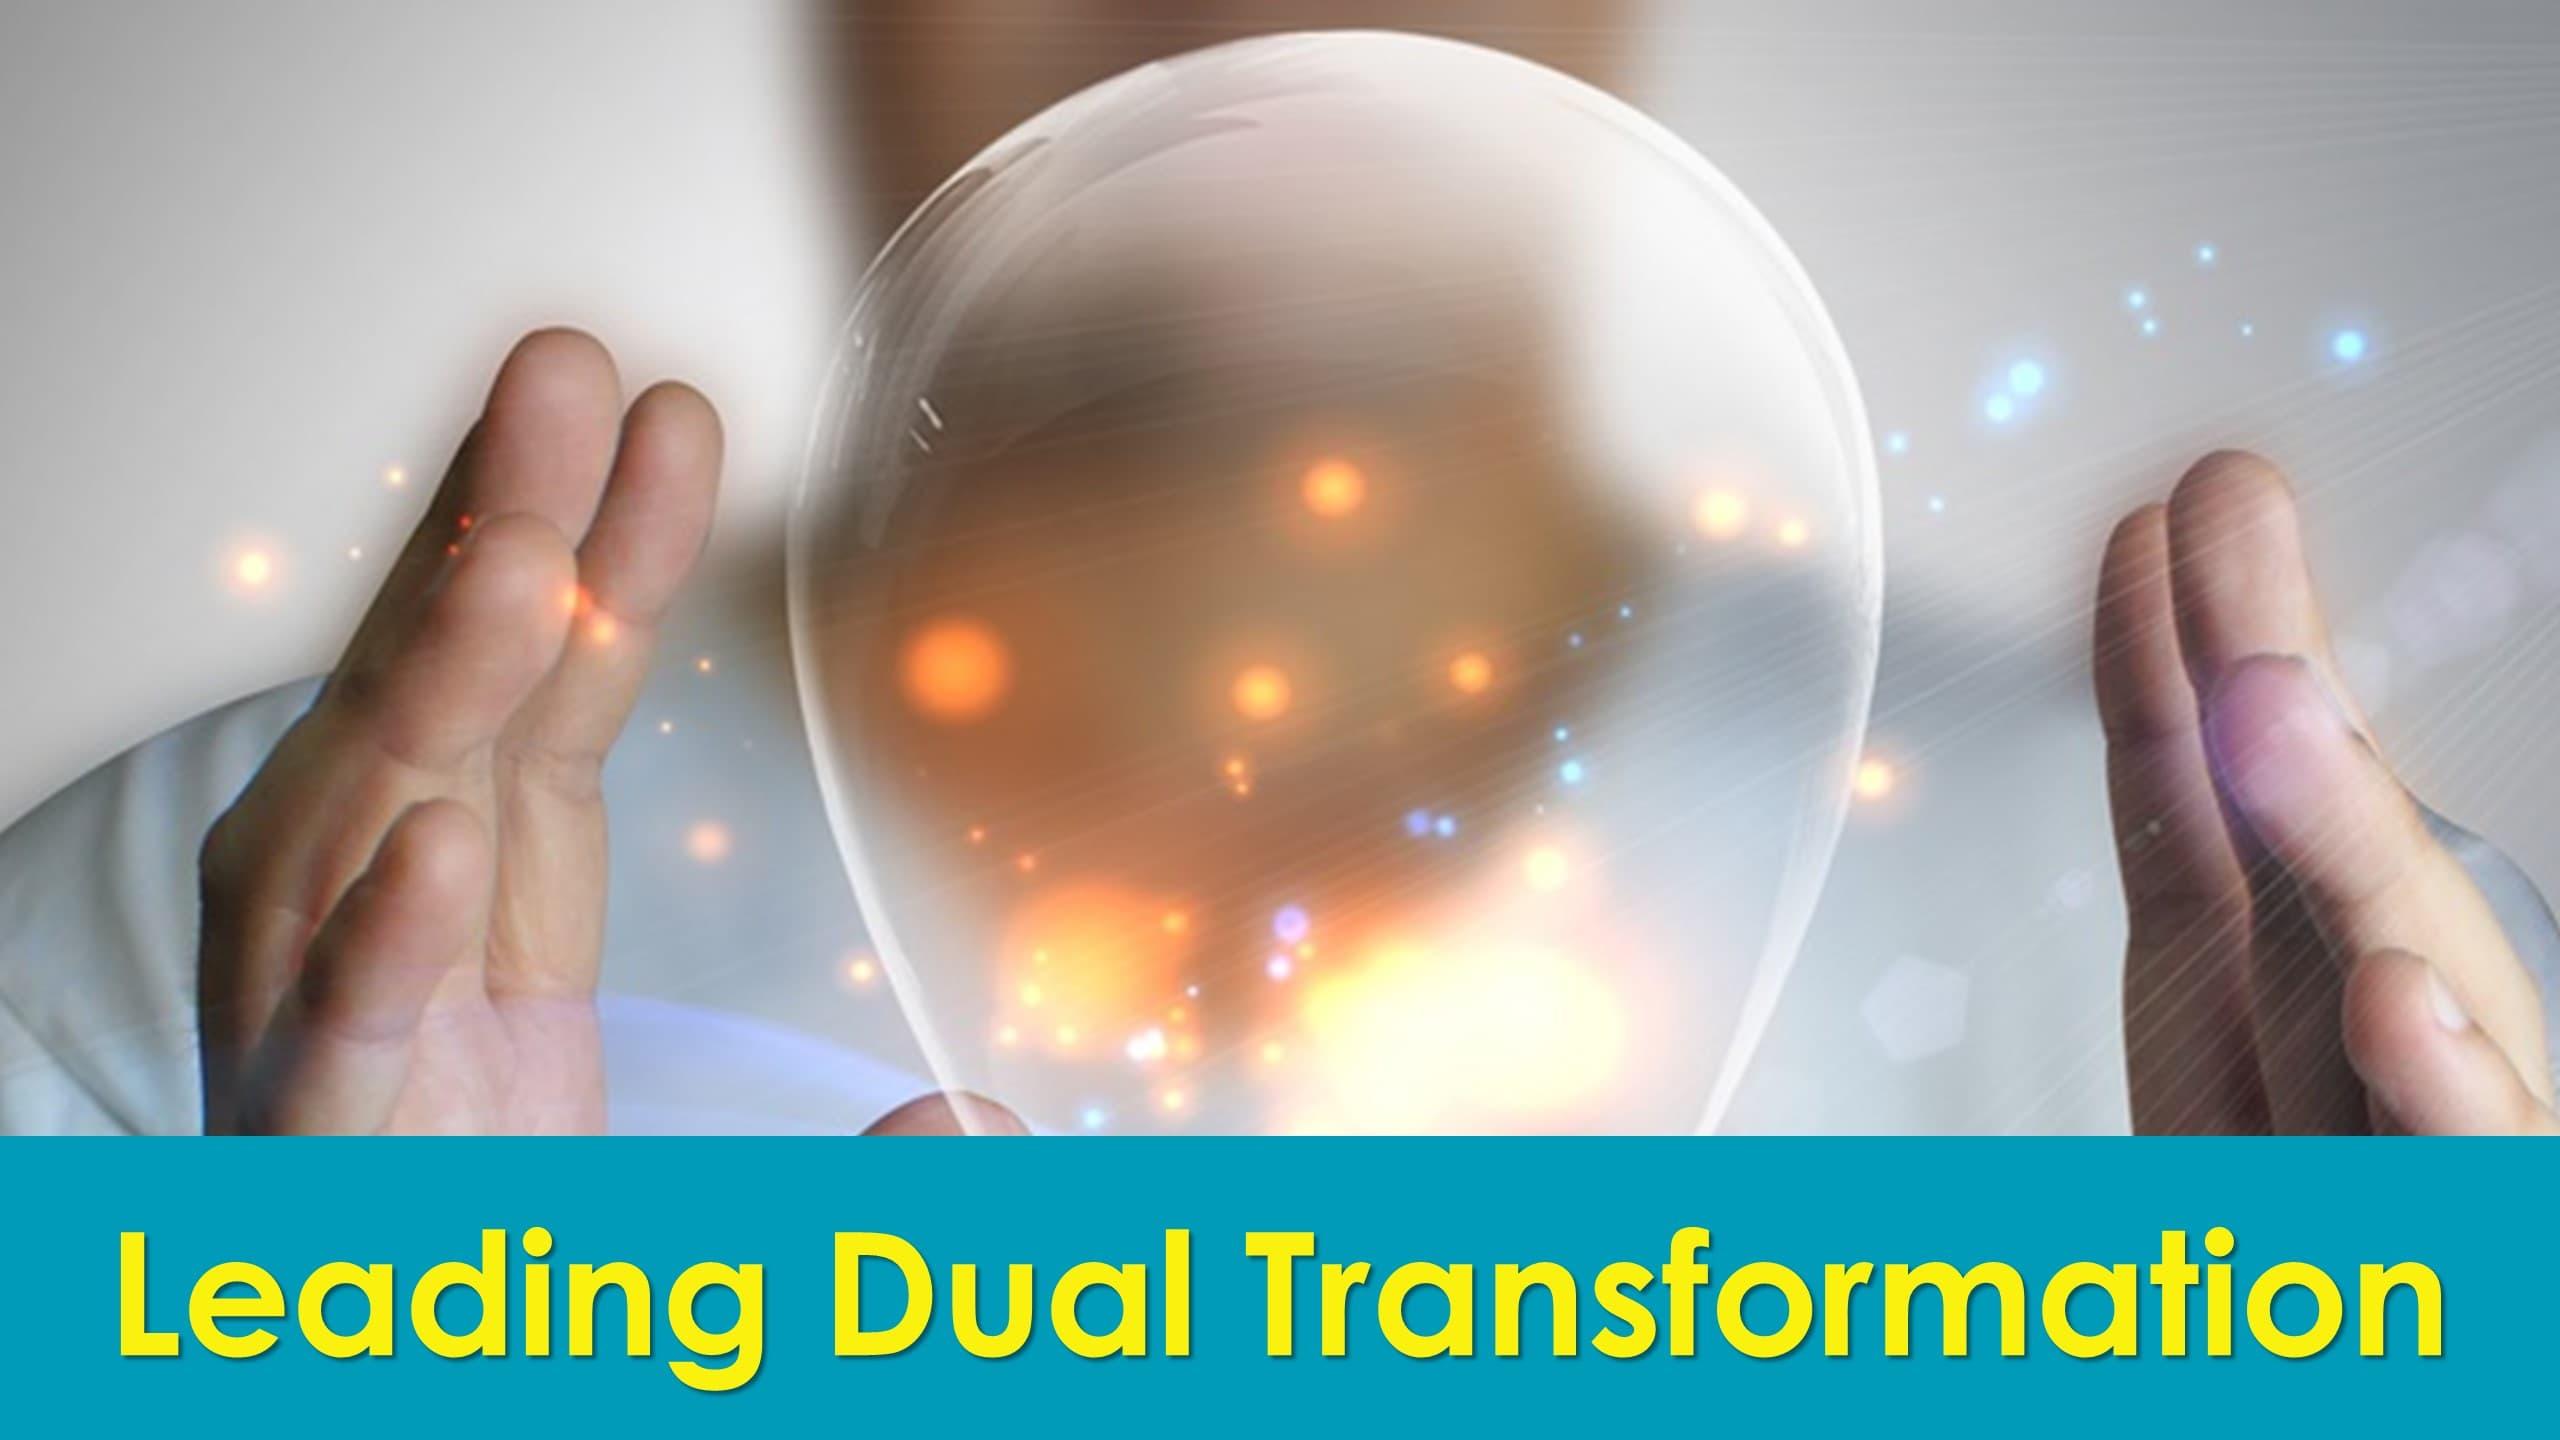 Leading Dual Transformation Slide 1